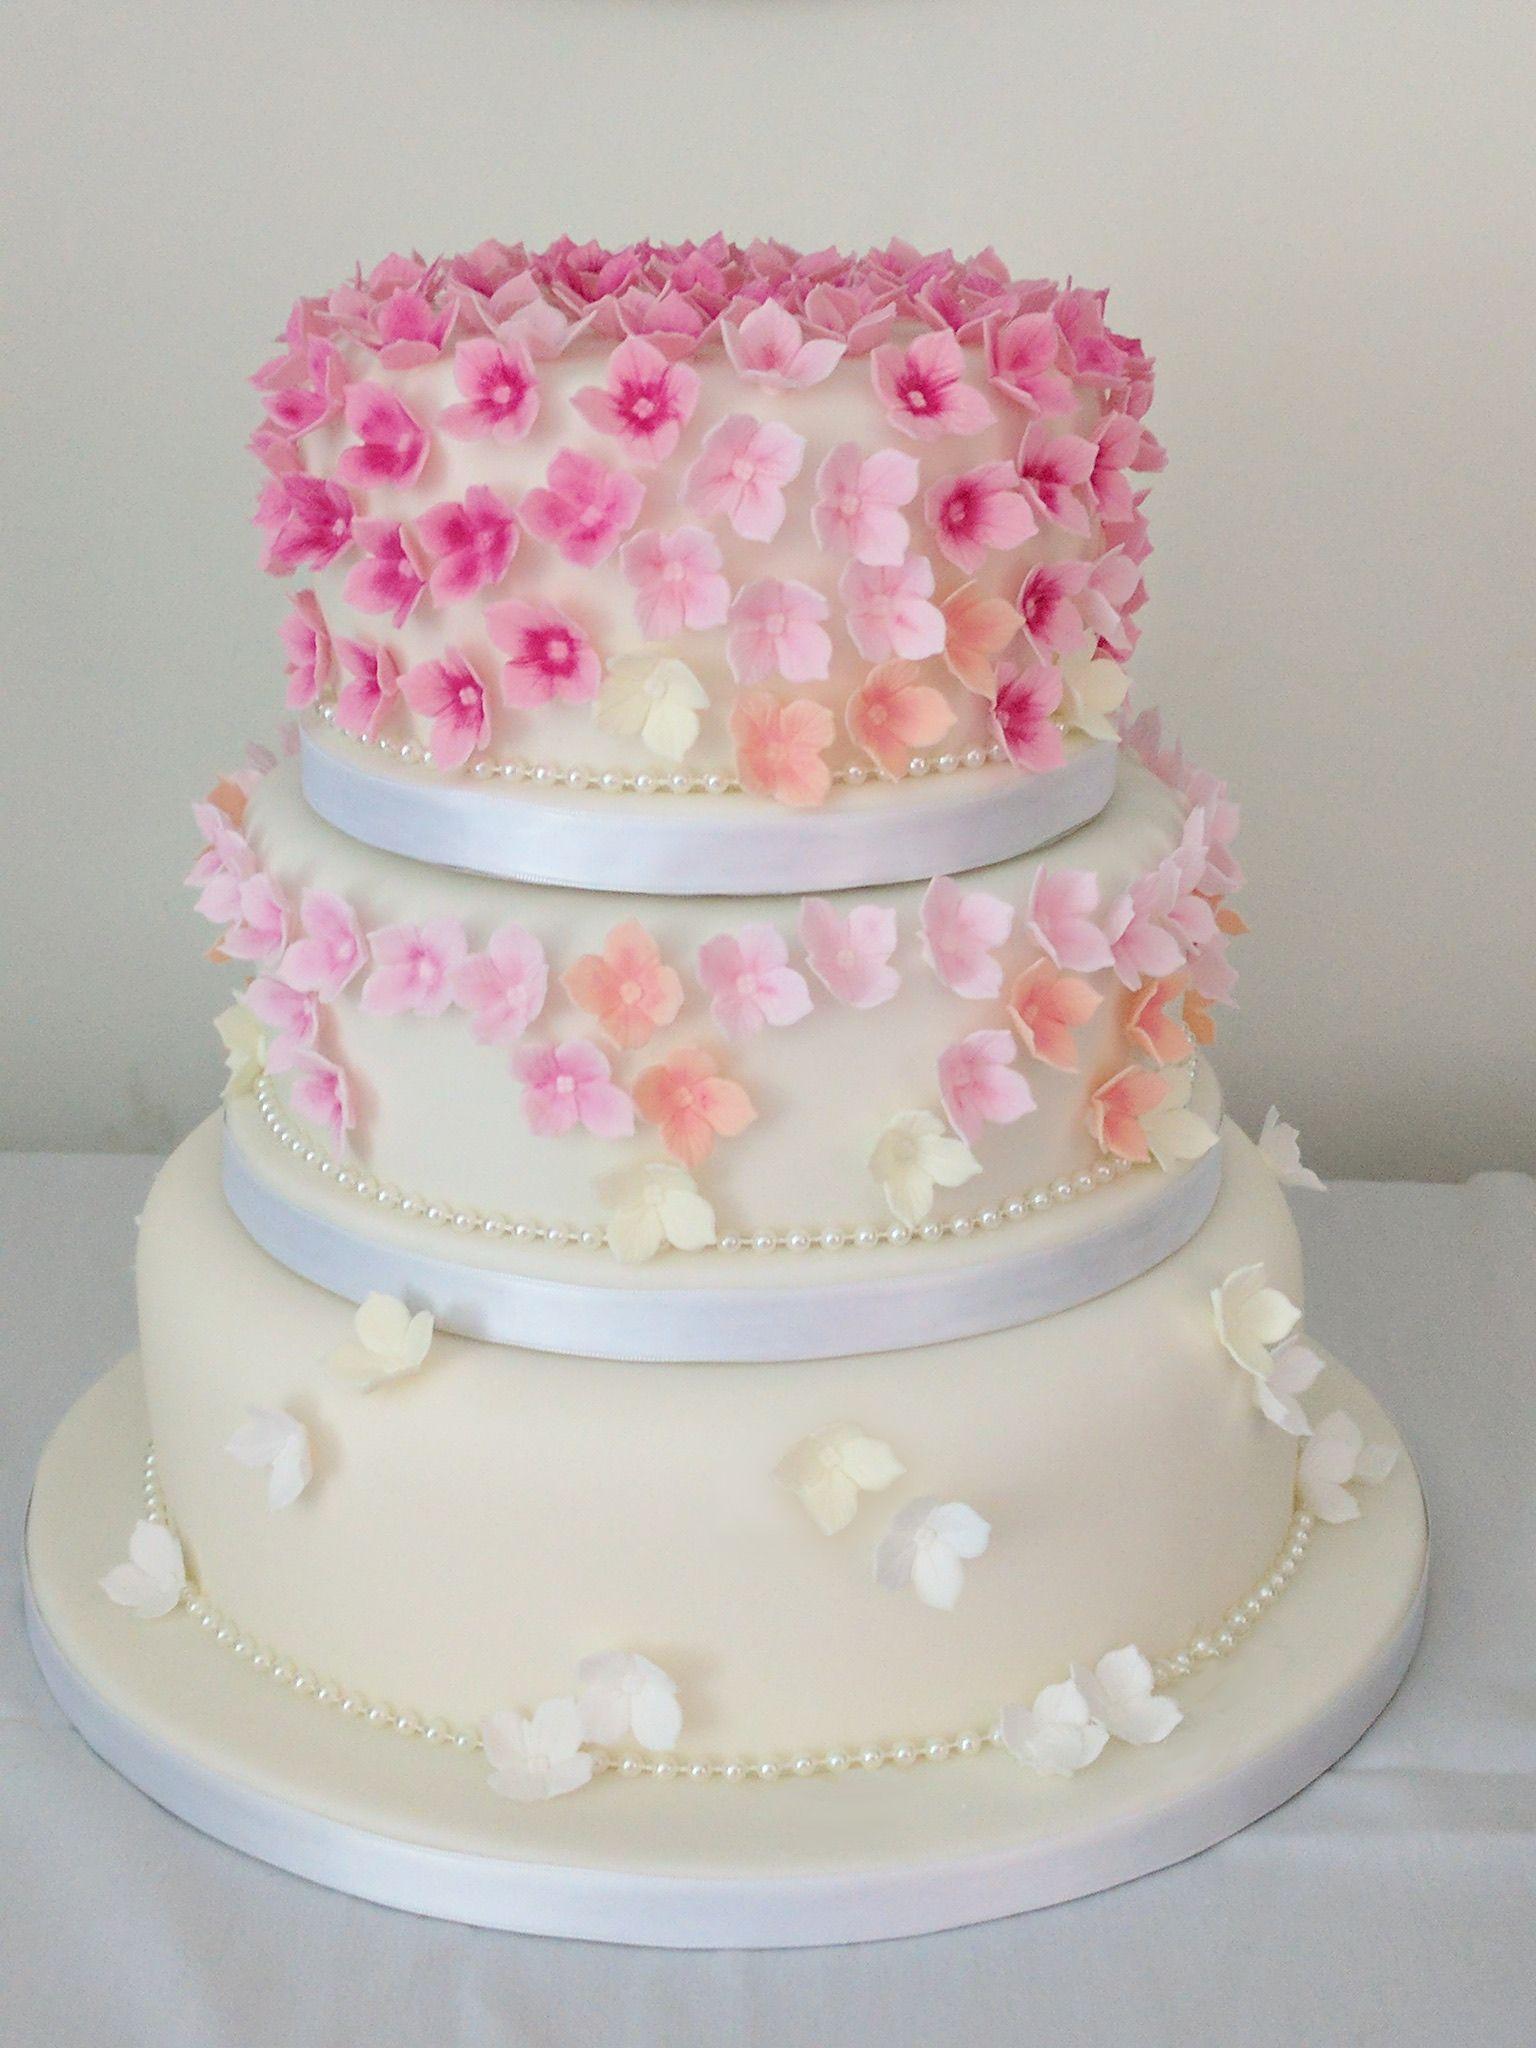 Three tiered wedding cake with ombré hydrangea flowers | wedcakes ...